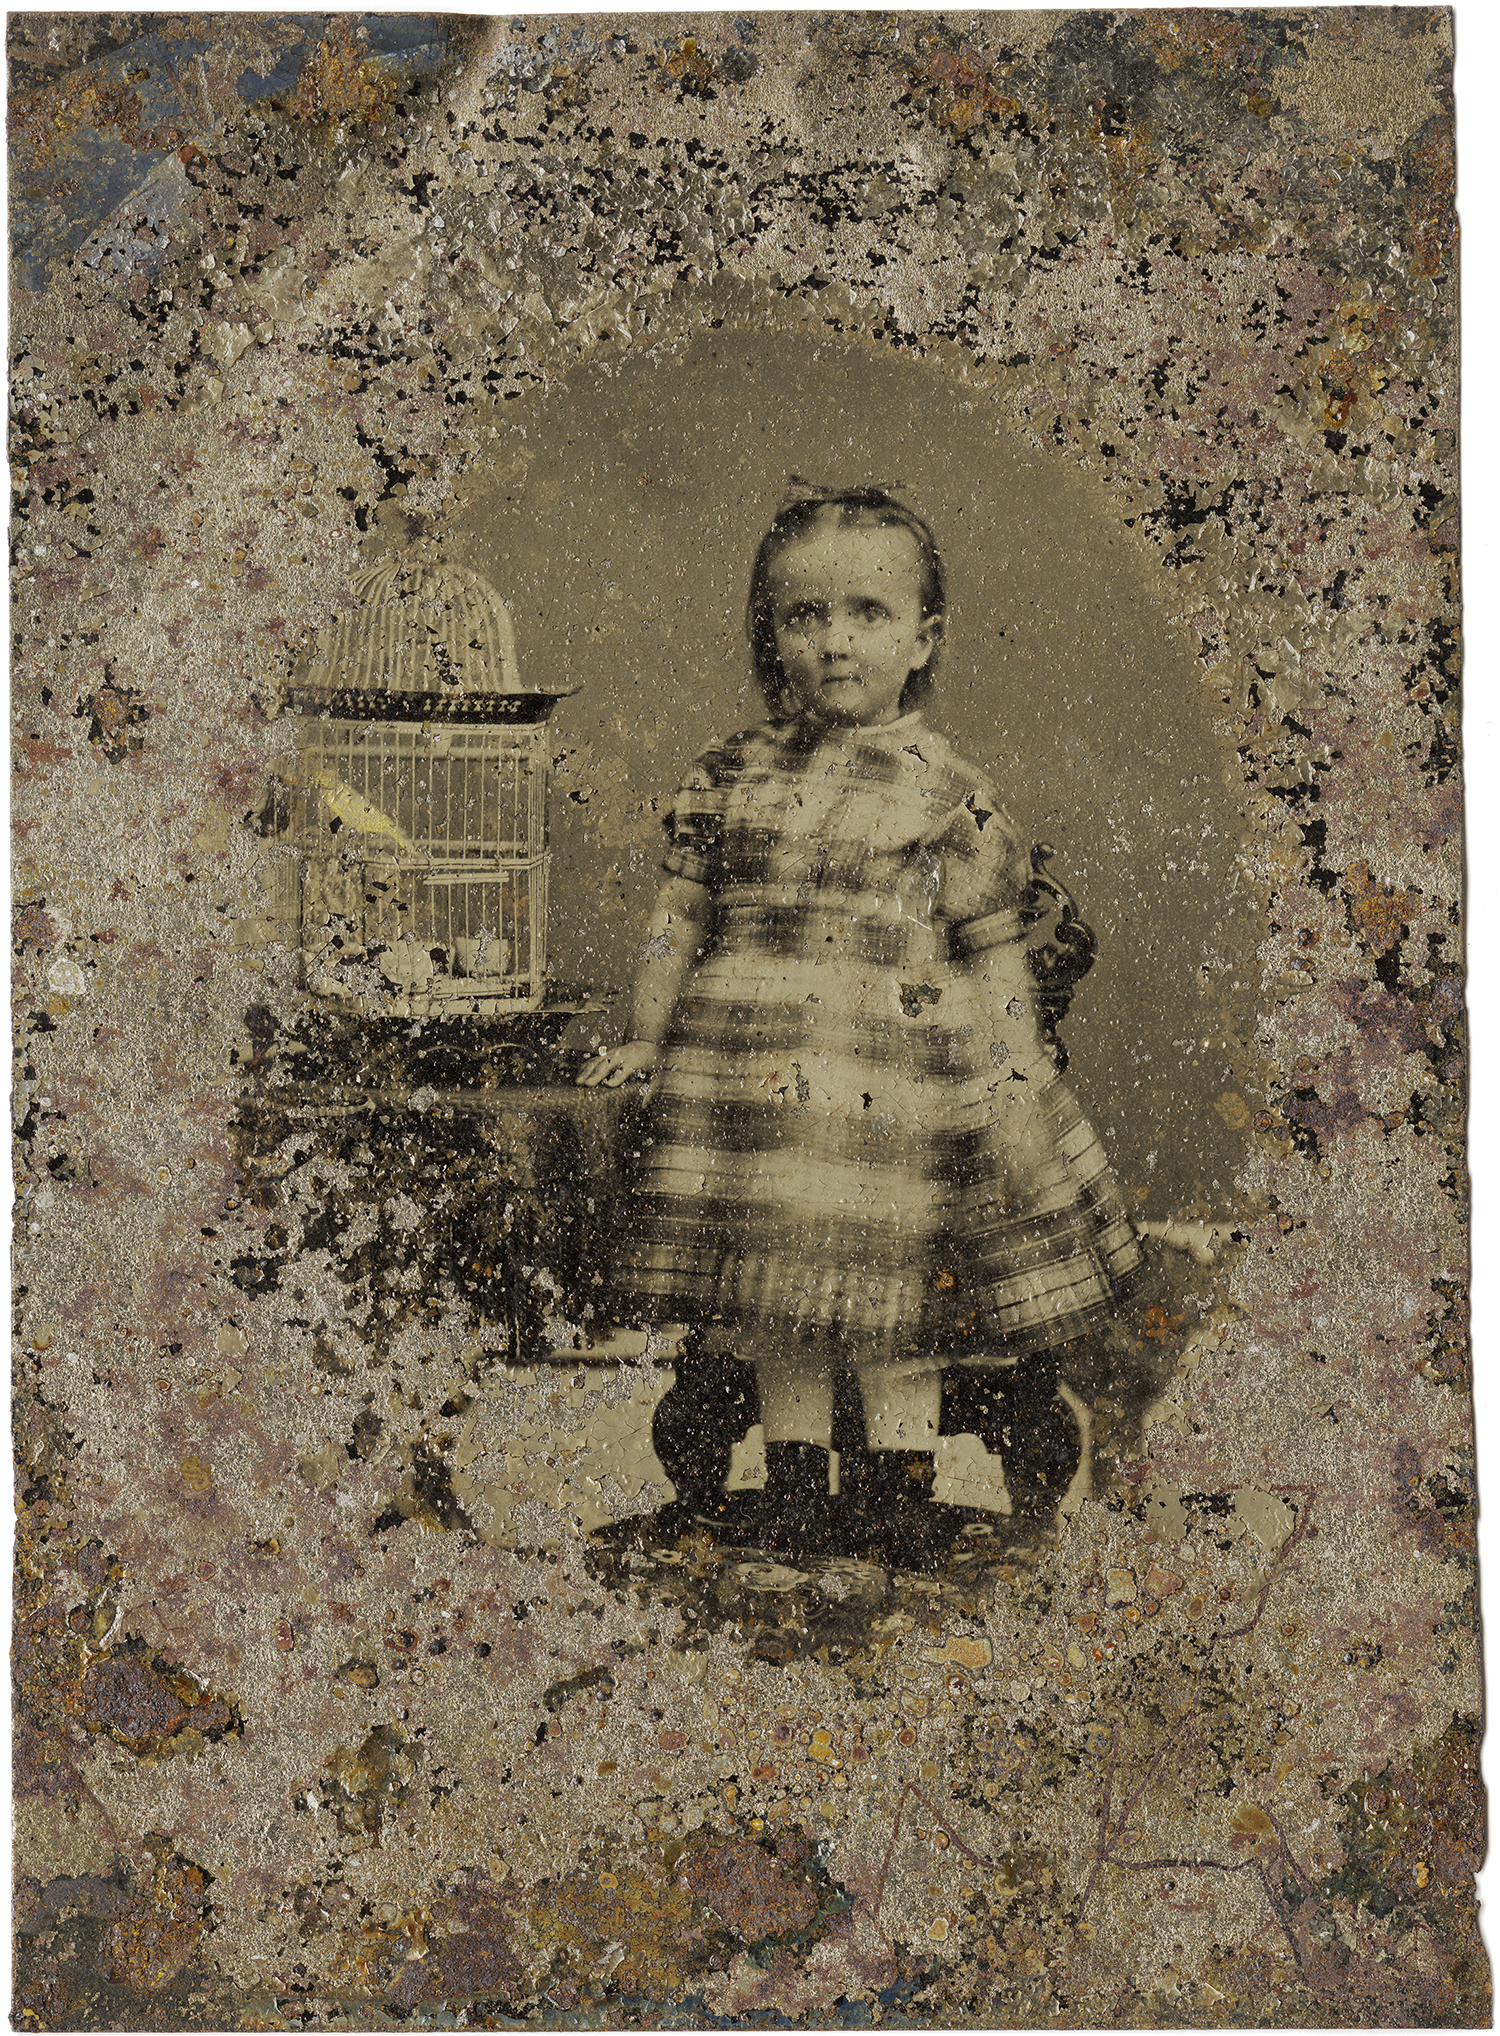 Little Girl with Birdcage, 2011 - LR12123